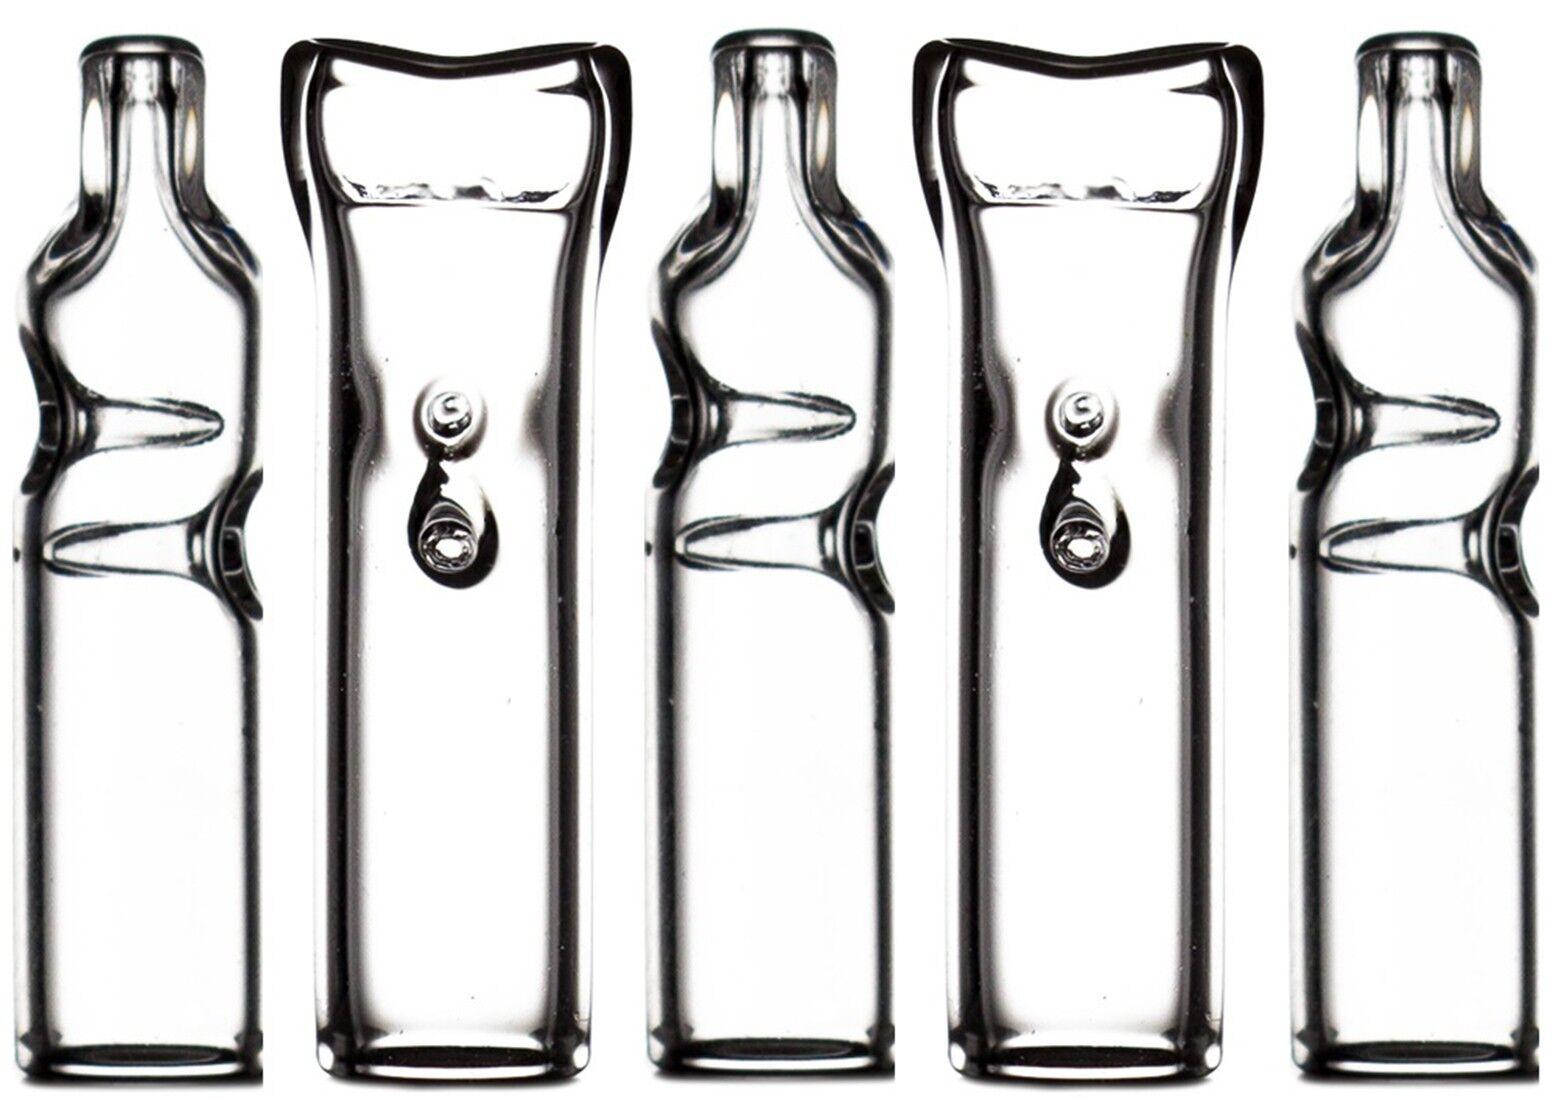 Dank Tips 5 Flat-Mouth Glass Filter Tips DankTips